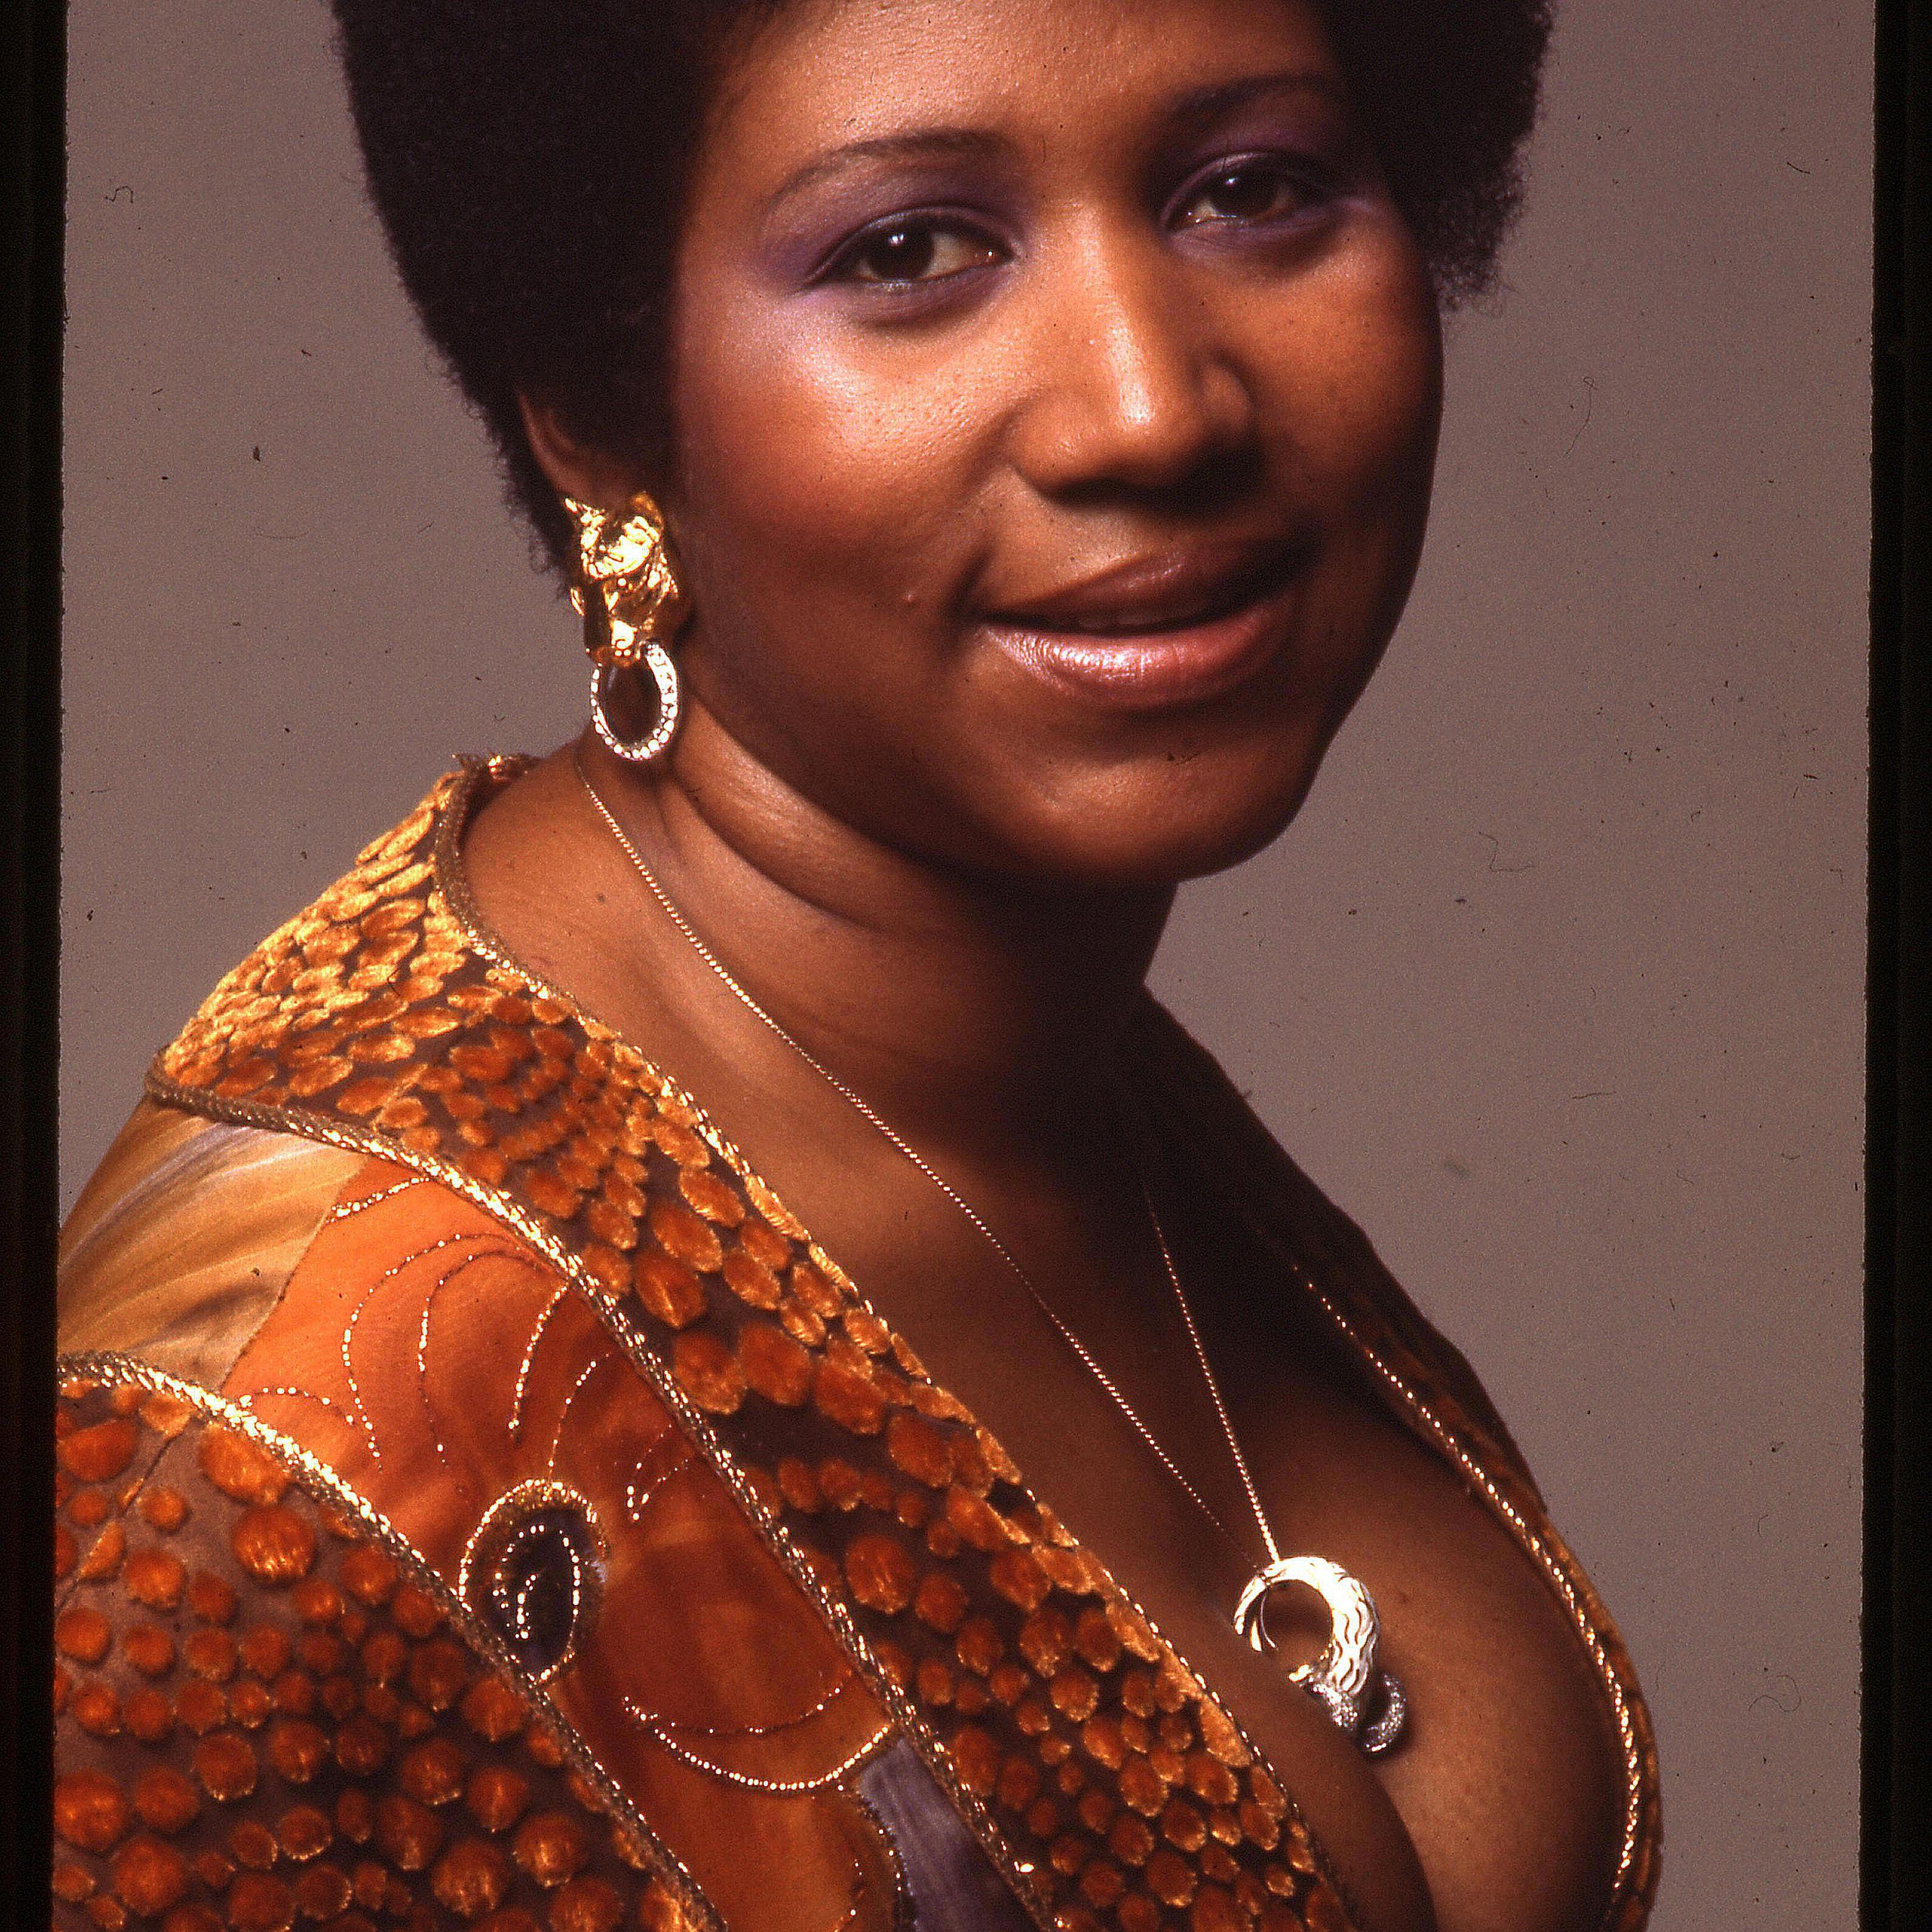 Portrait of Aretha Franklin.